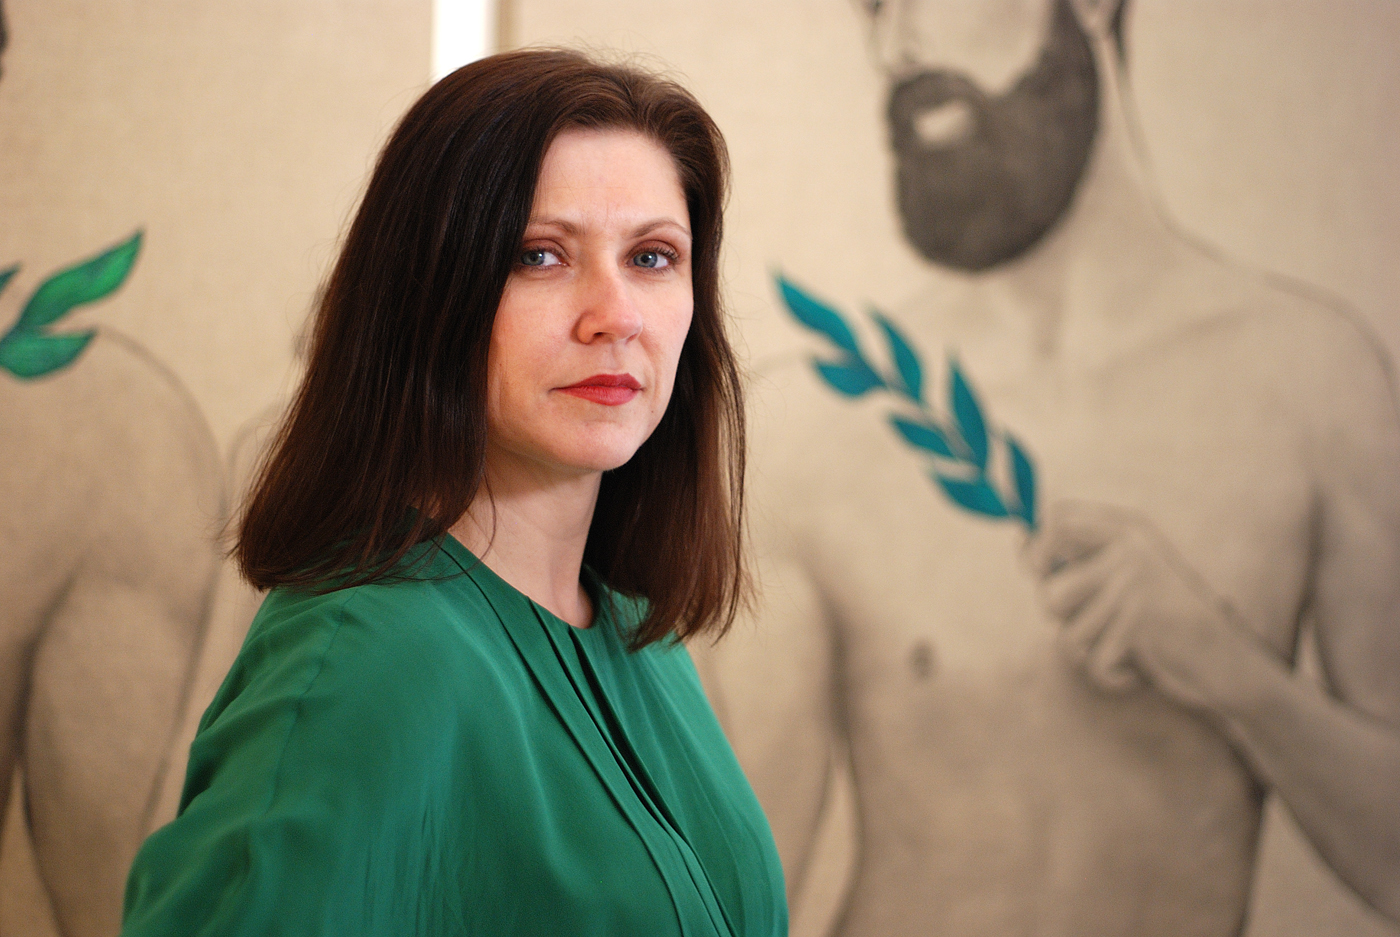 Kristin Hjellegerde director at Hjellegerde Gallery, Wandsworth, London with Disciple with Leaves, Spring and Summer (2013) by Mathew Tom.   kristinhjellegjerde.com